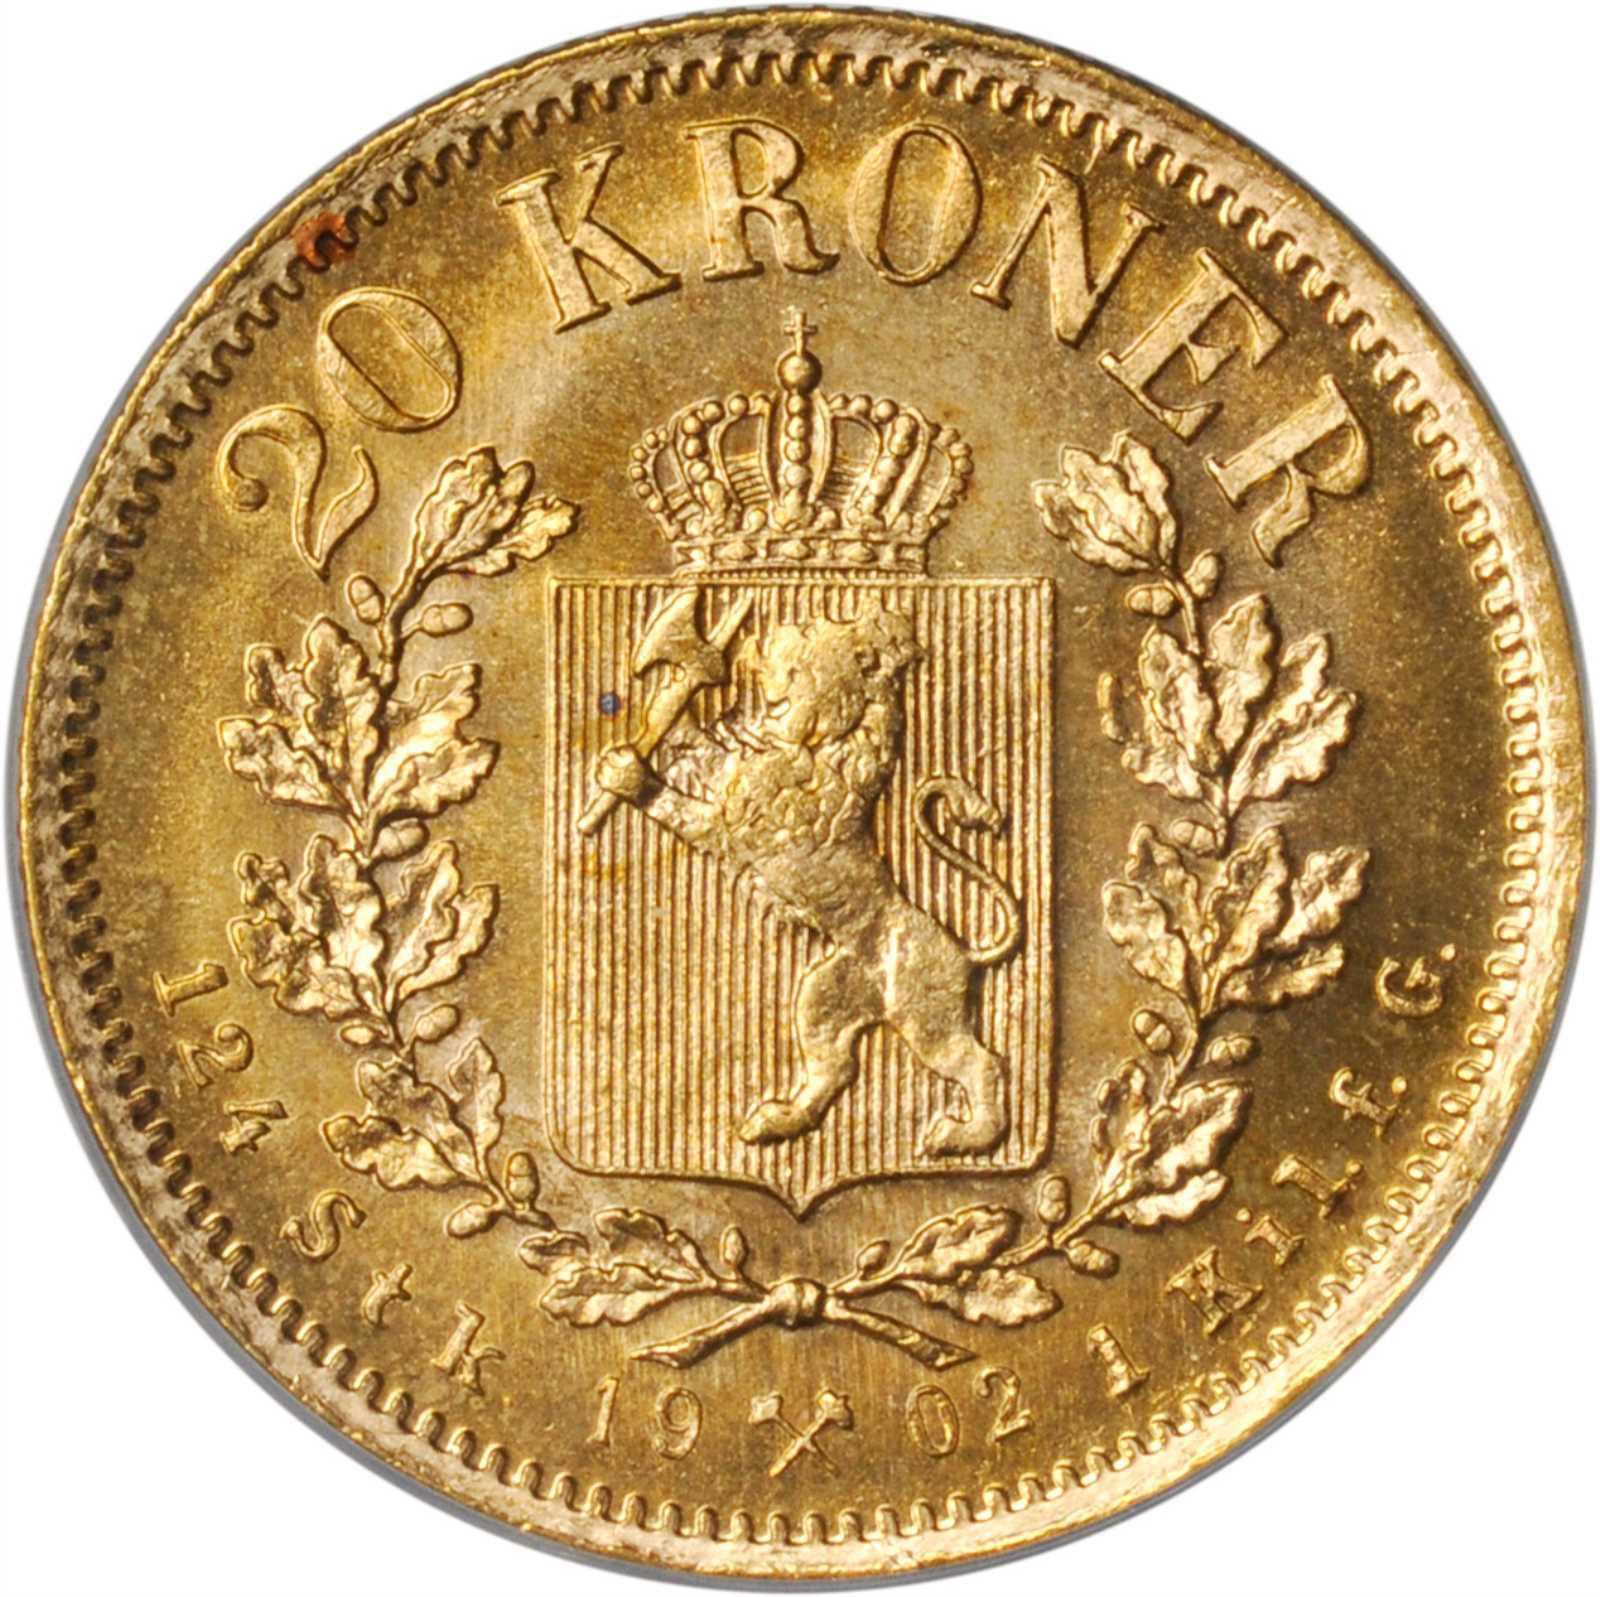 1902 Norge 20 Kroner Gull Kv 0/01 ANACS MS65